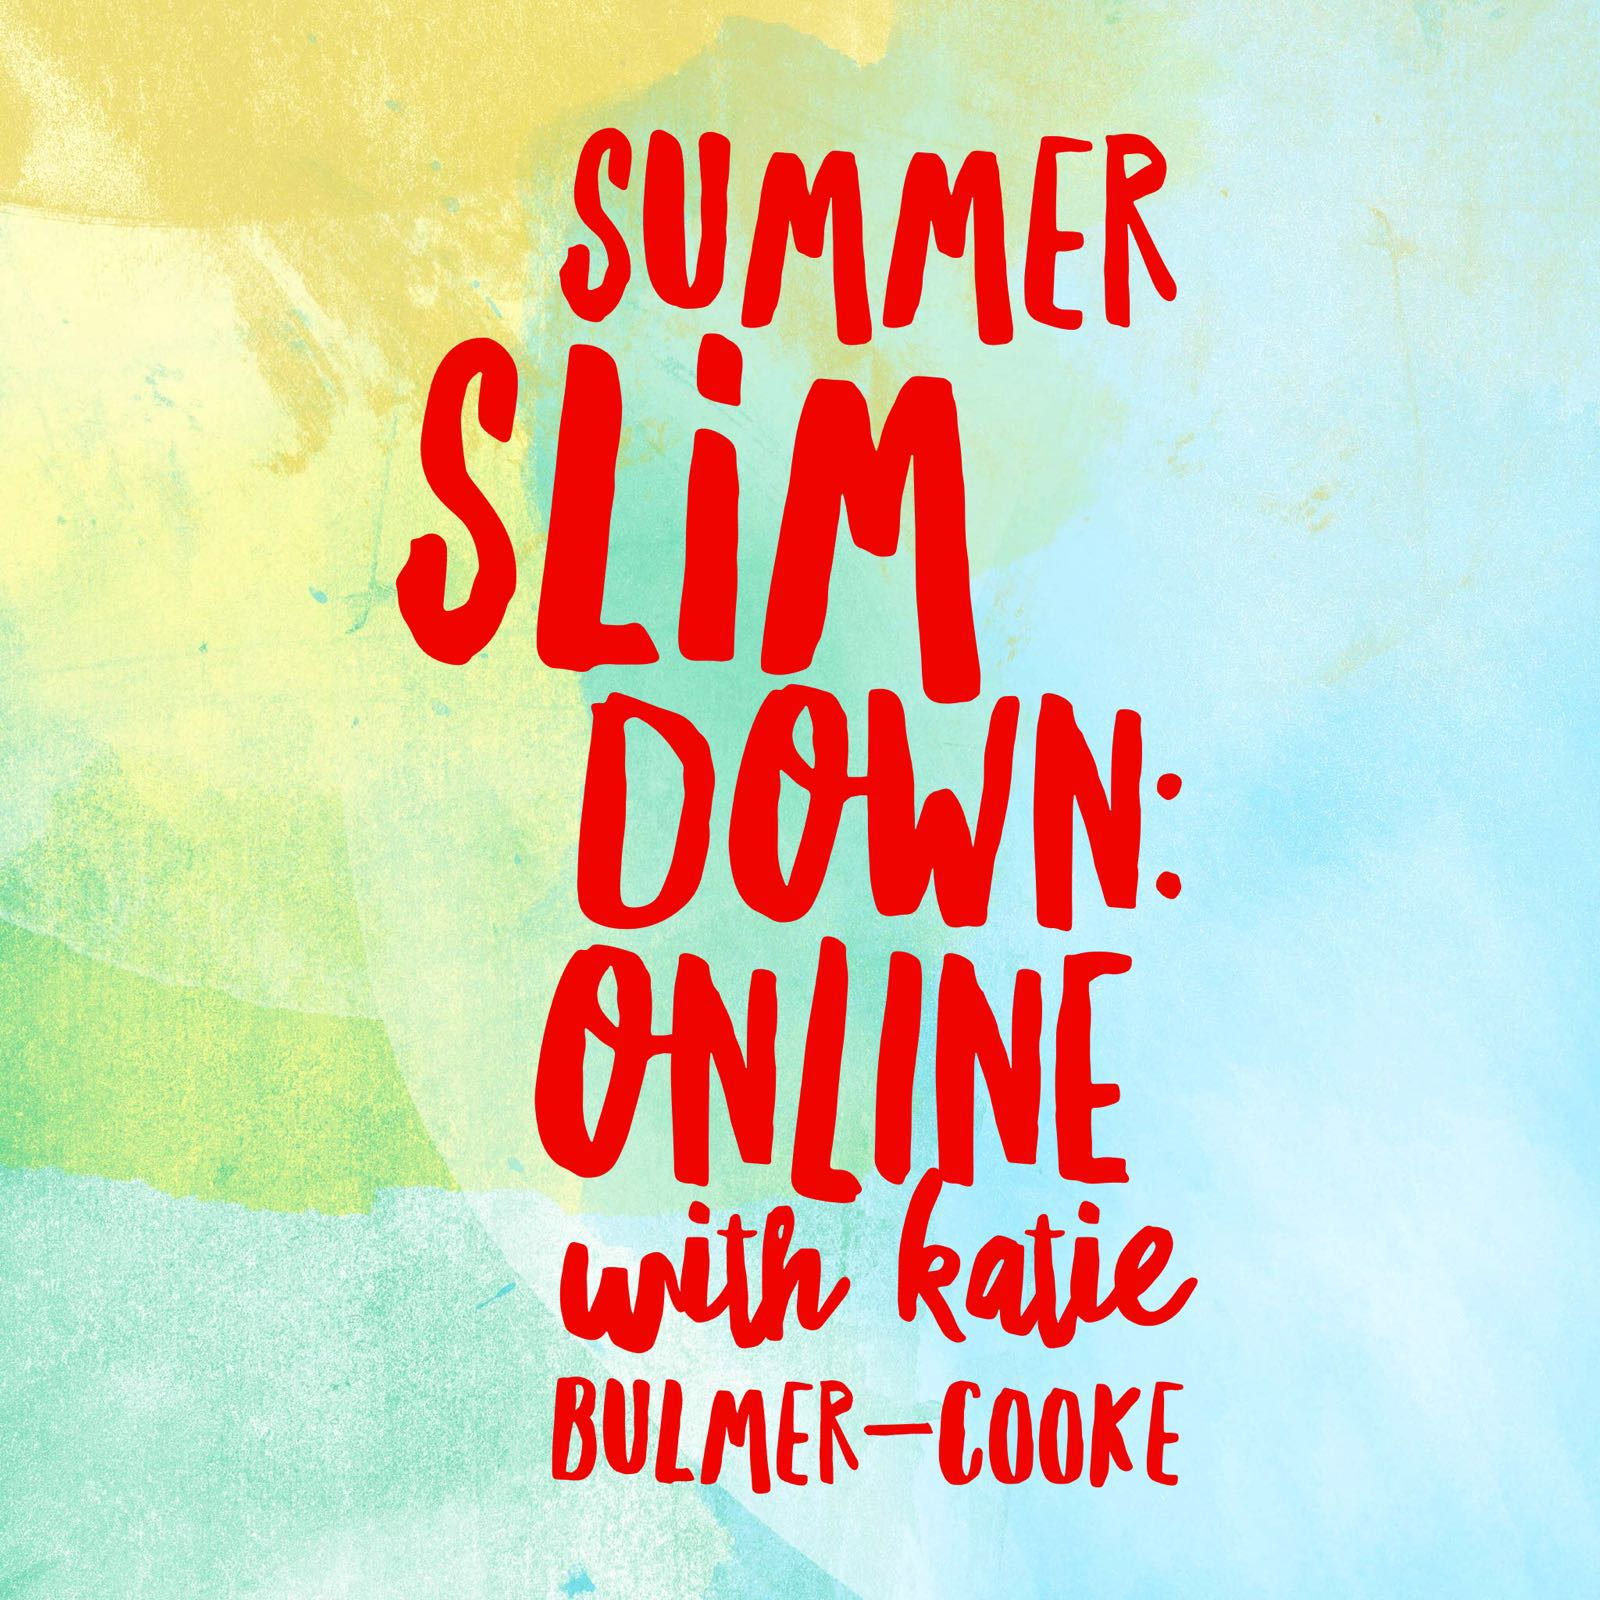 Summer Slim Down: Online with Katie Bulmer-Cooke